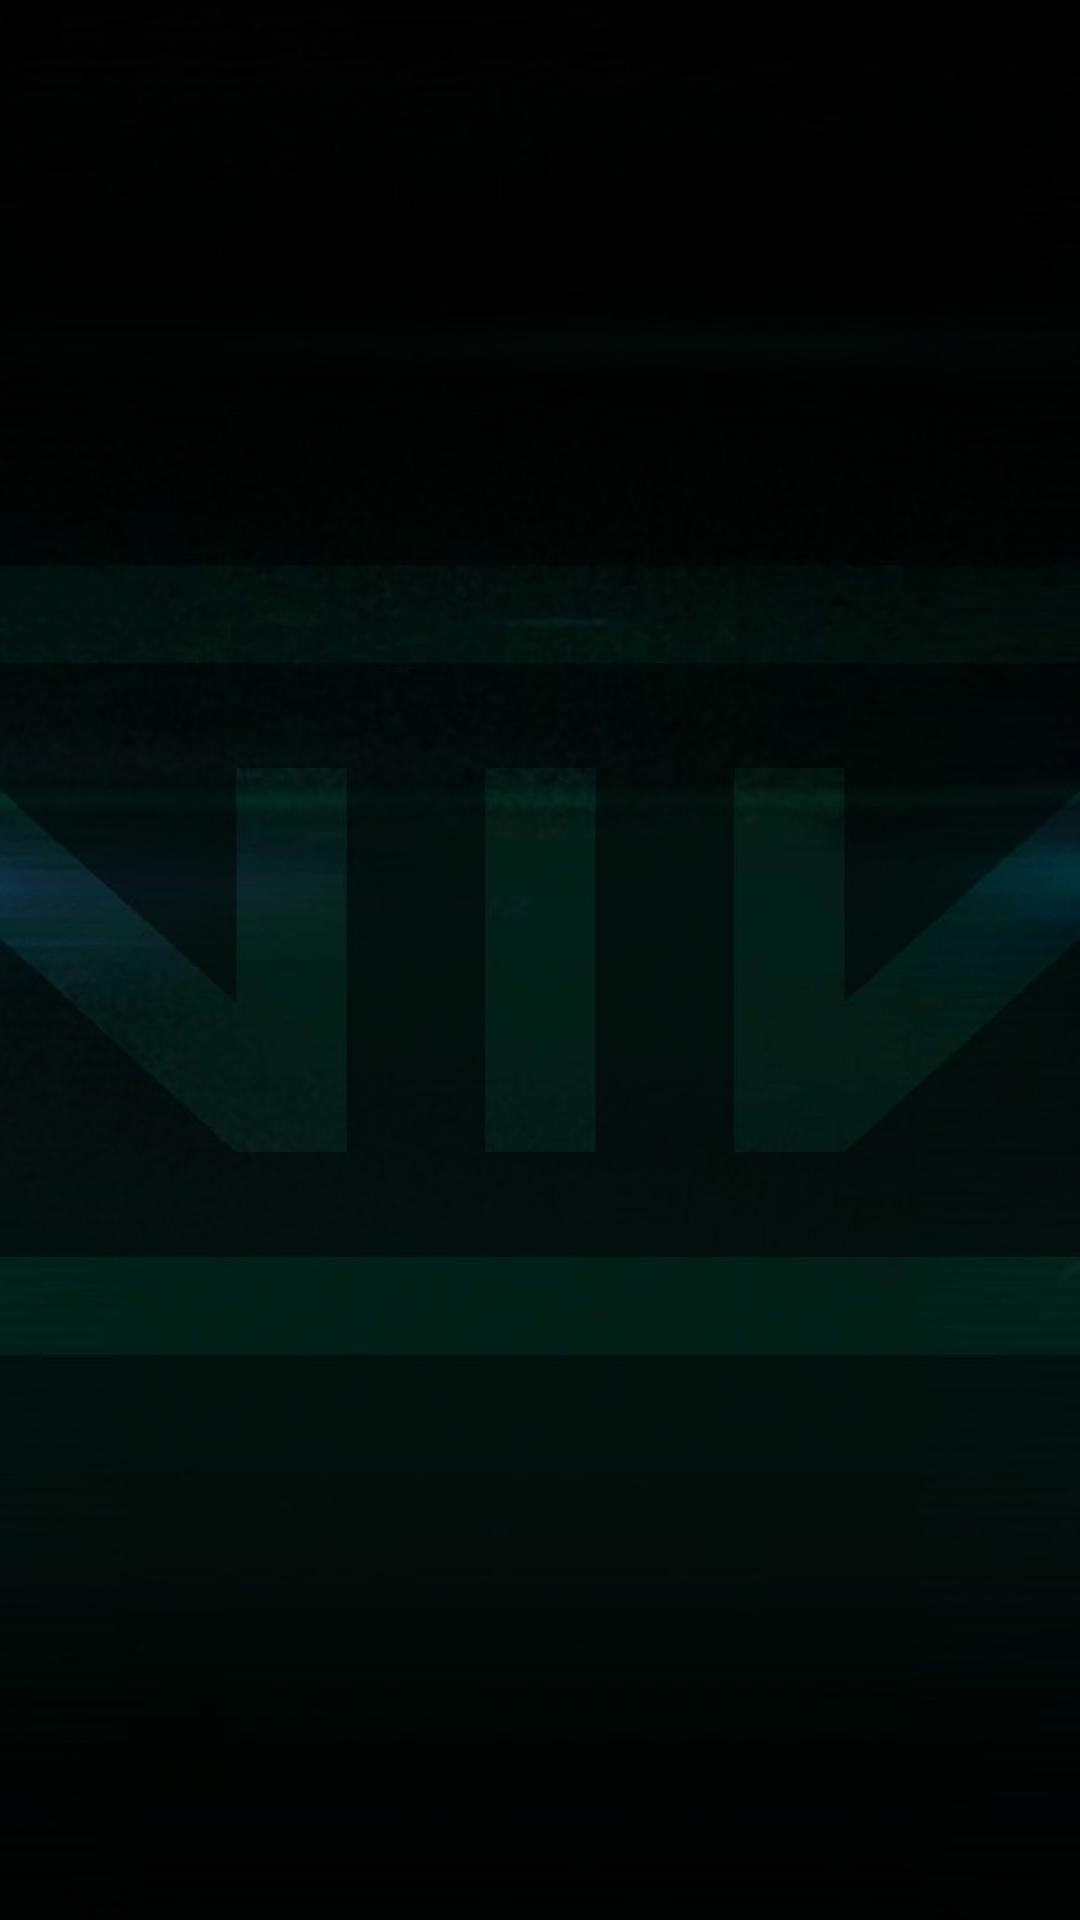 Free Download Nine Inch Nails Trent Reznor Wallpaper 88613